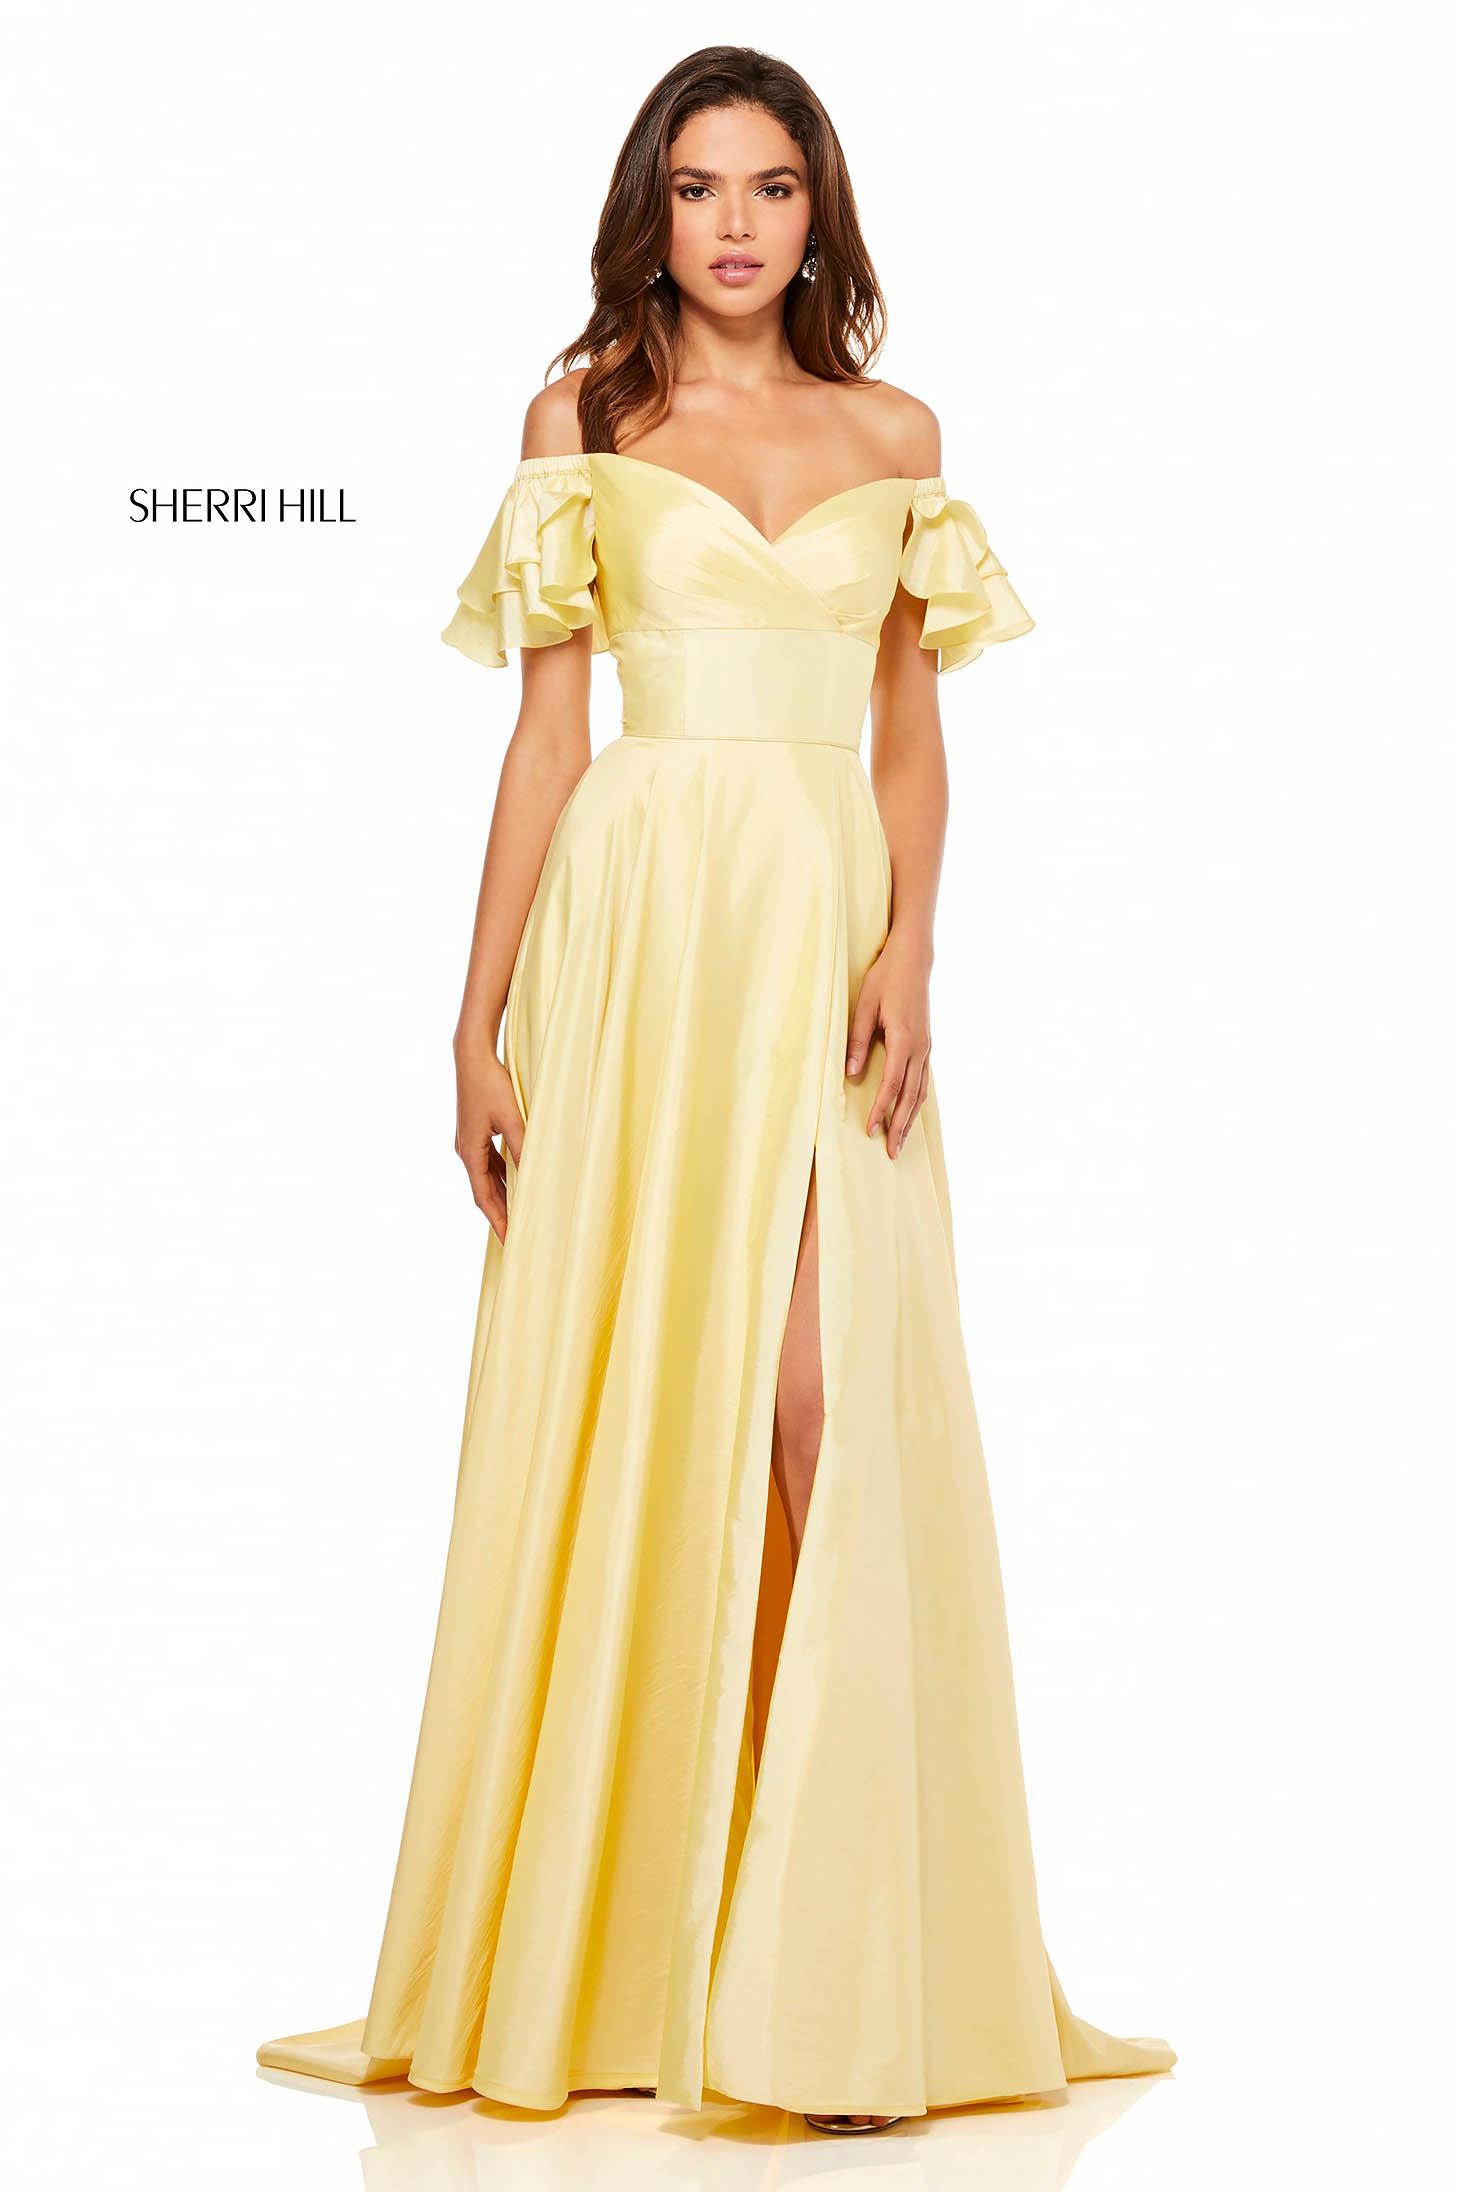 Sherri Hill 52469 Yellow Dress